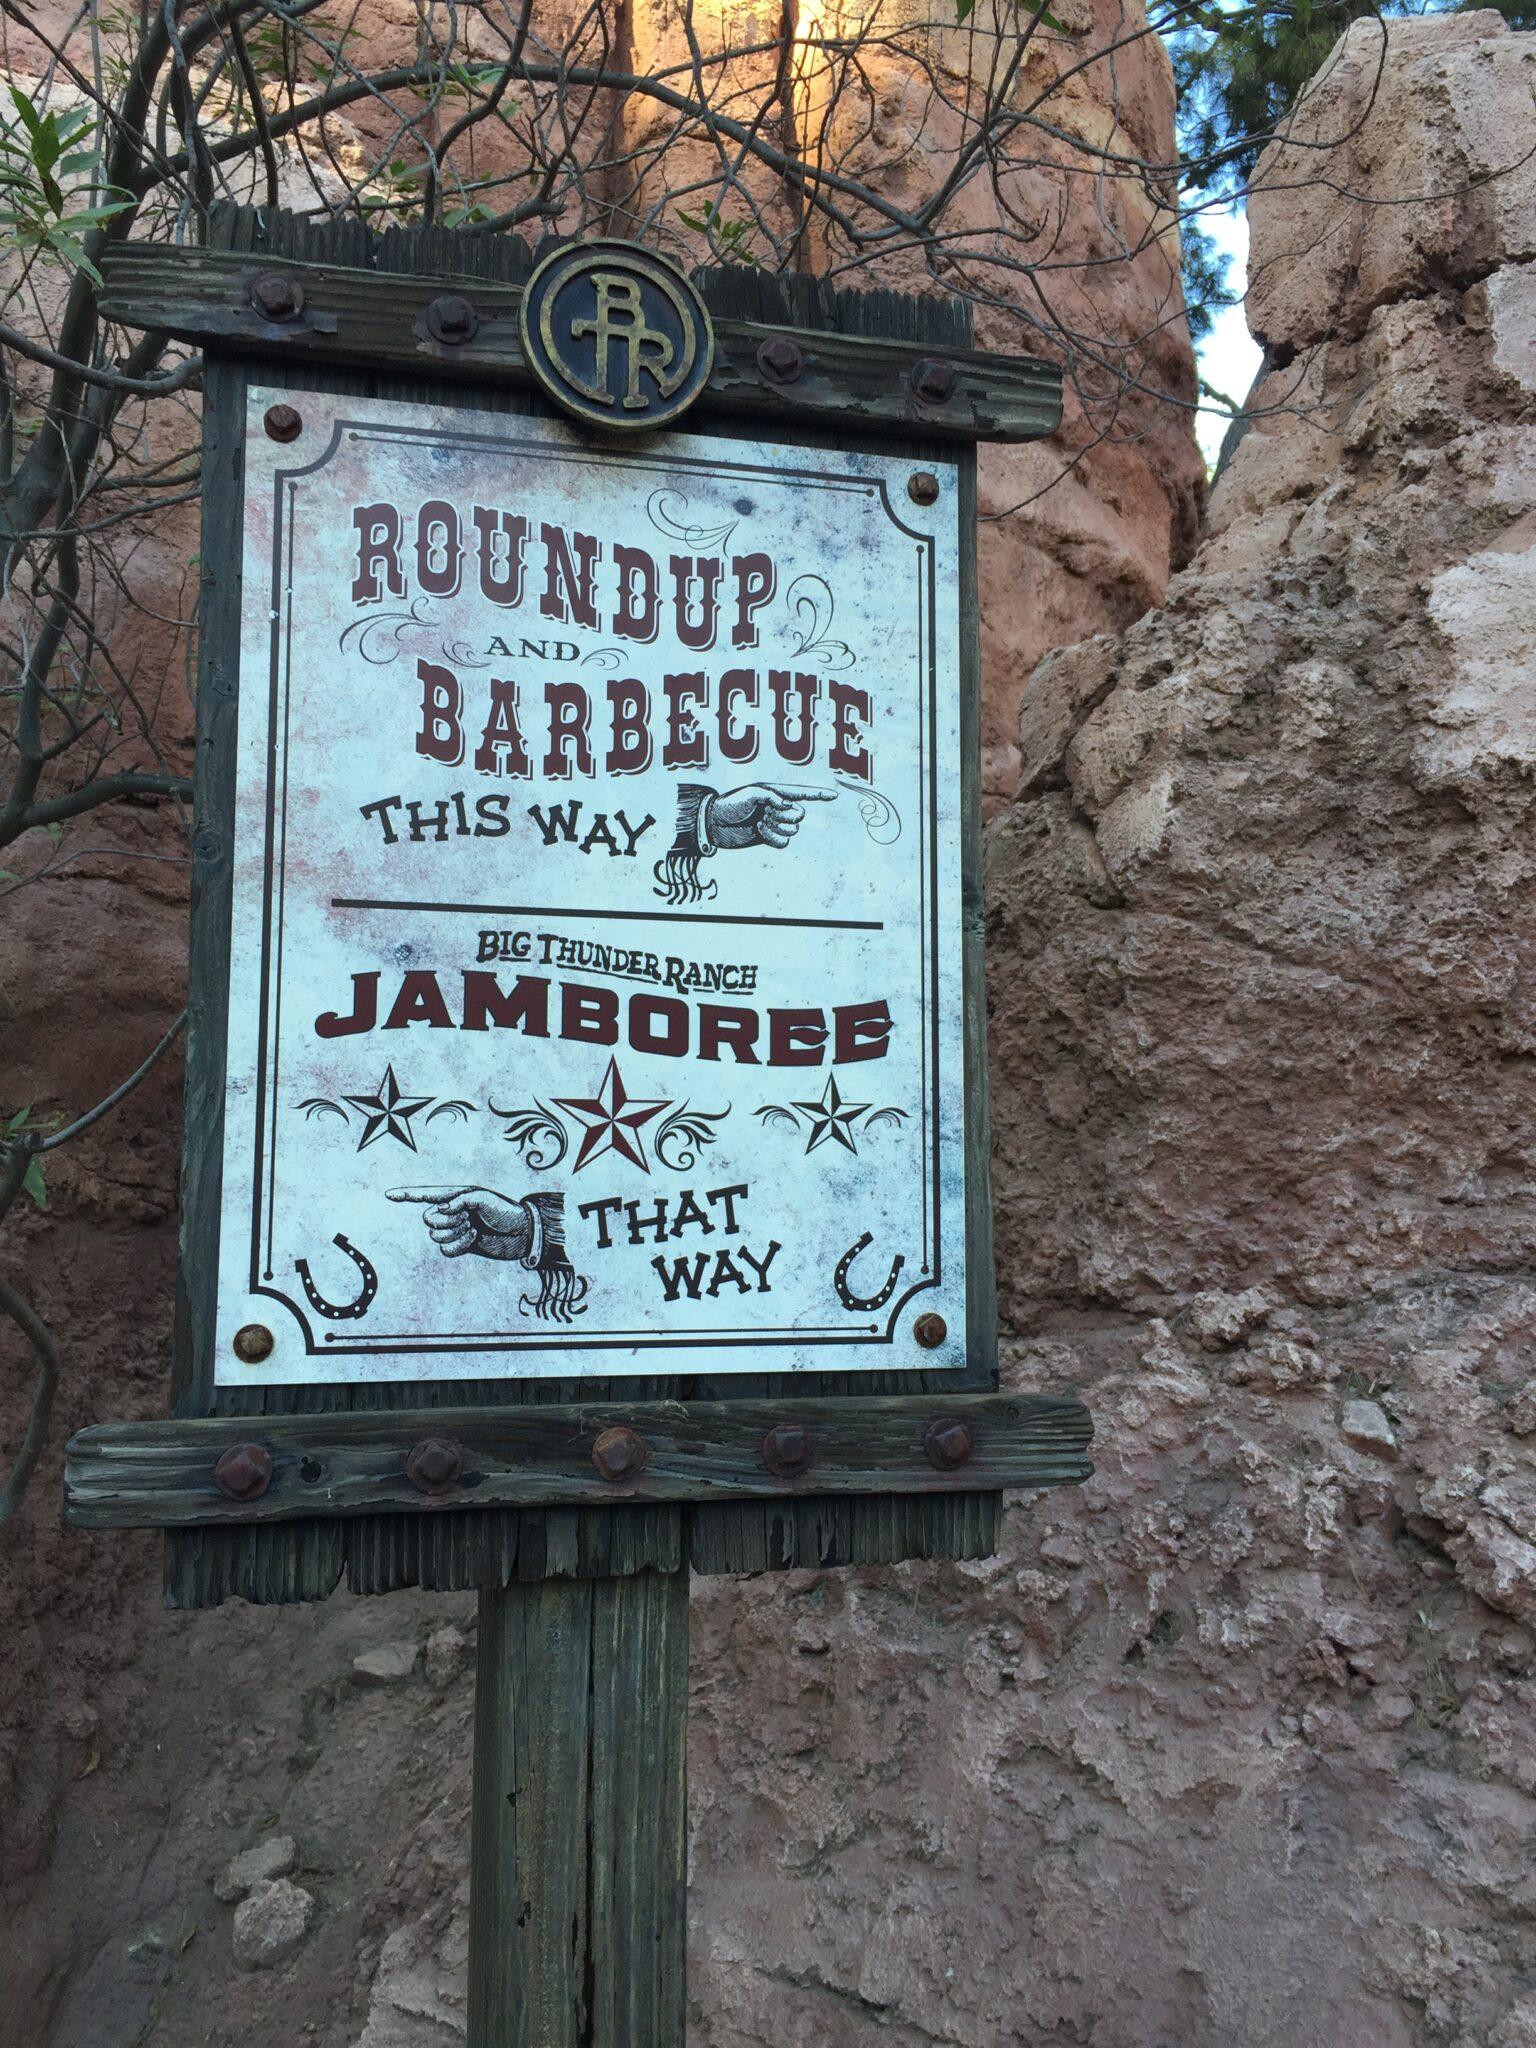 Remembering Big Thunder Ranch BBQ at Disneyland